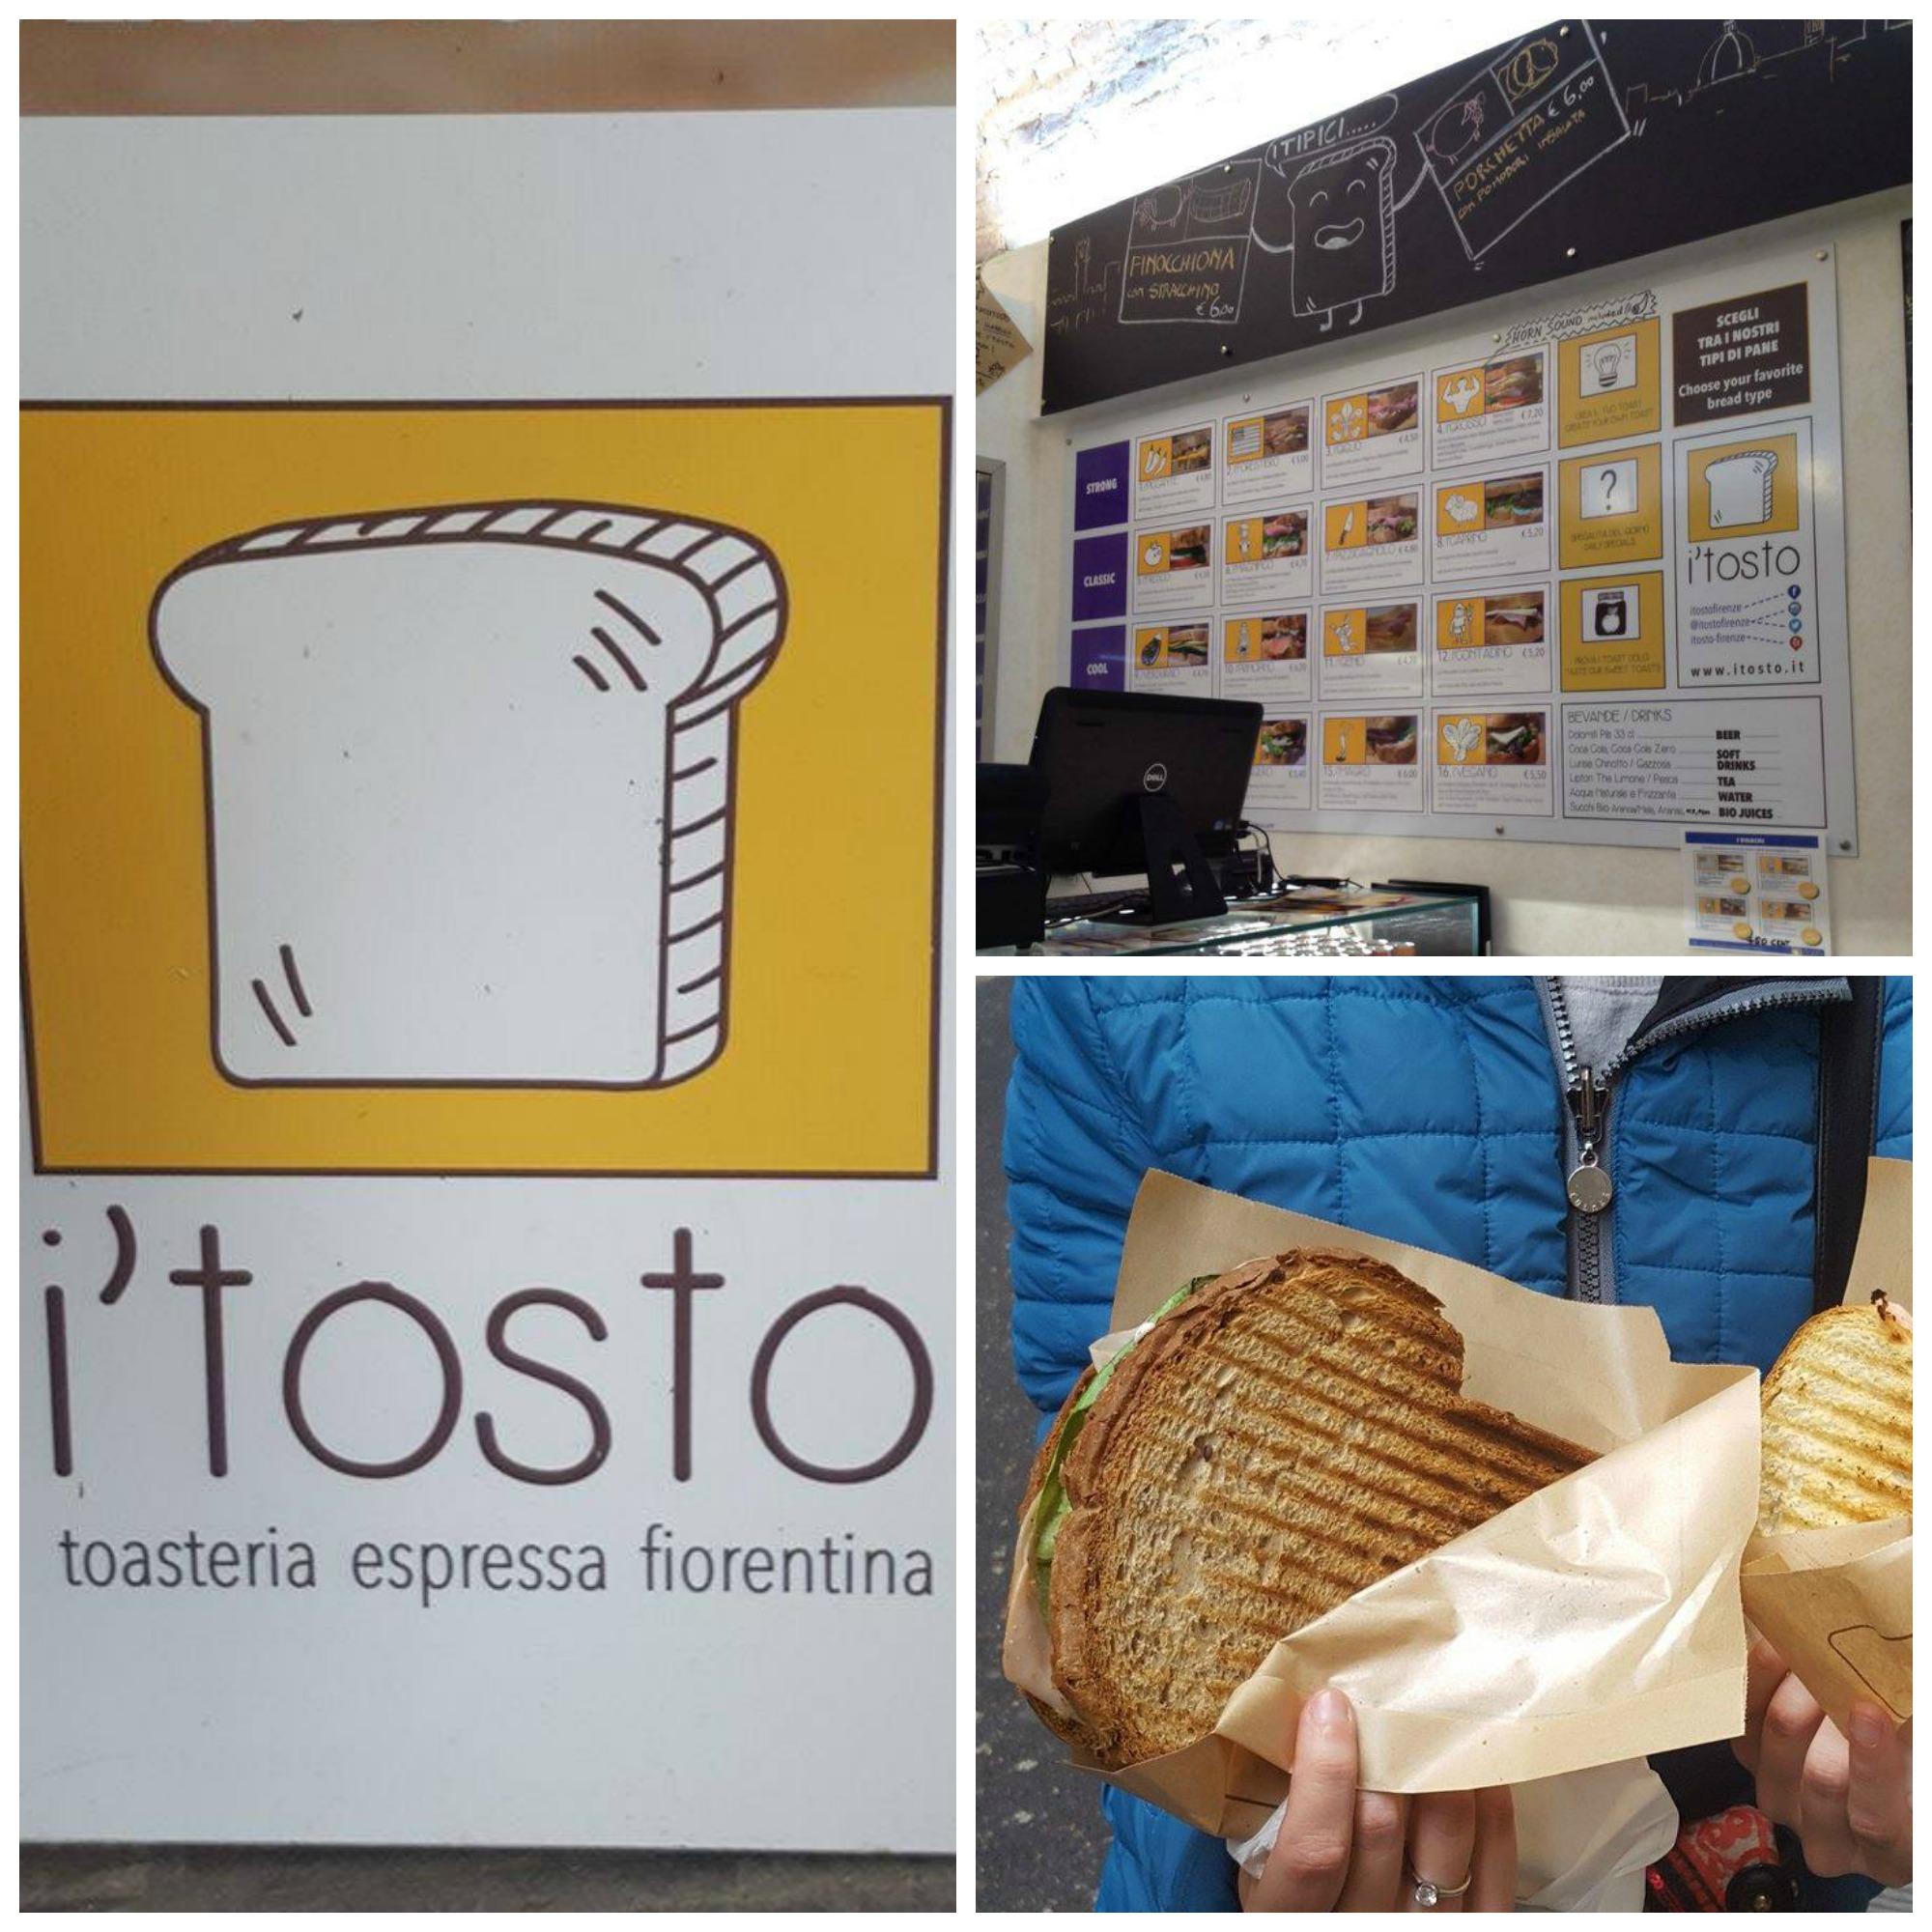 GustiAMO FIRENZE: Dove mangiare a Firenze - i'tosto - Toasteria Espressa Fiorentina